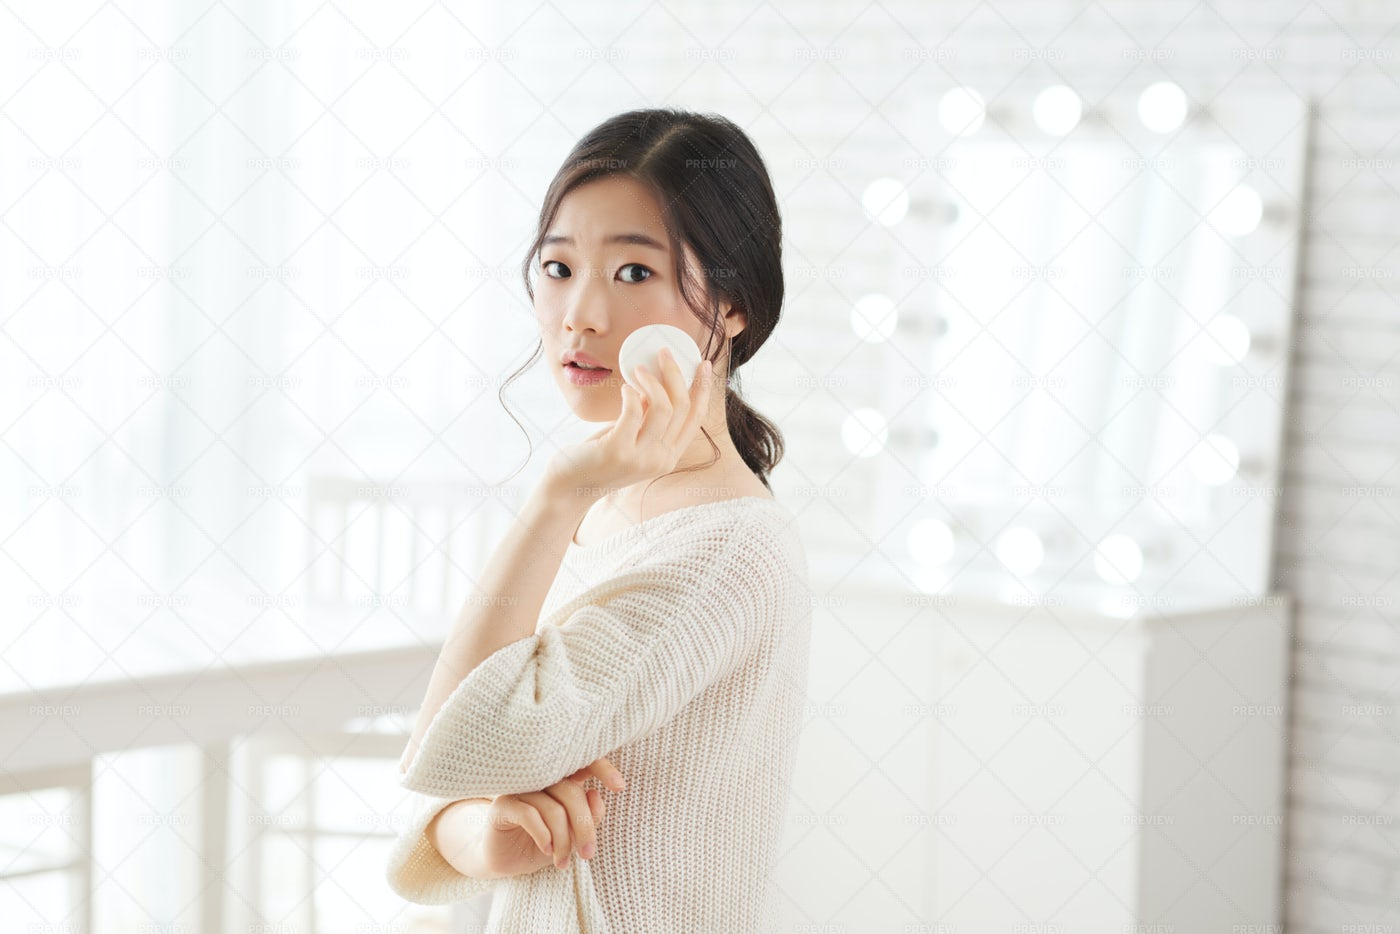 Young Woman Doing Make-up: Stock Photos